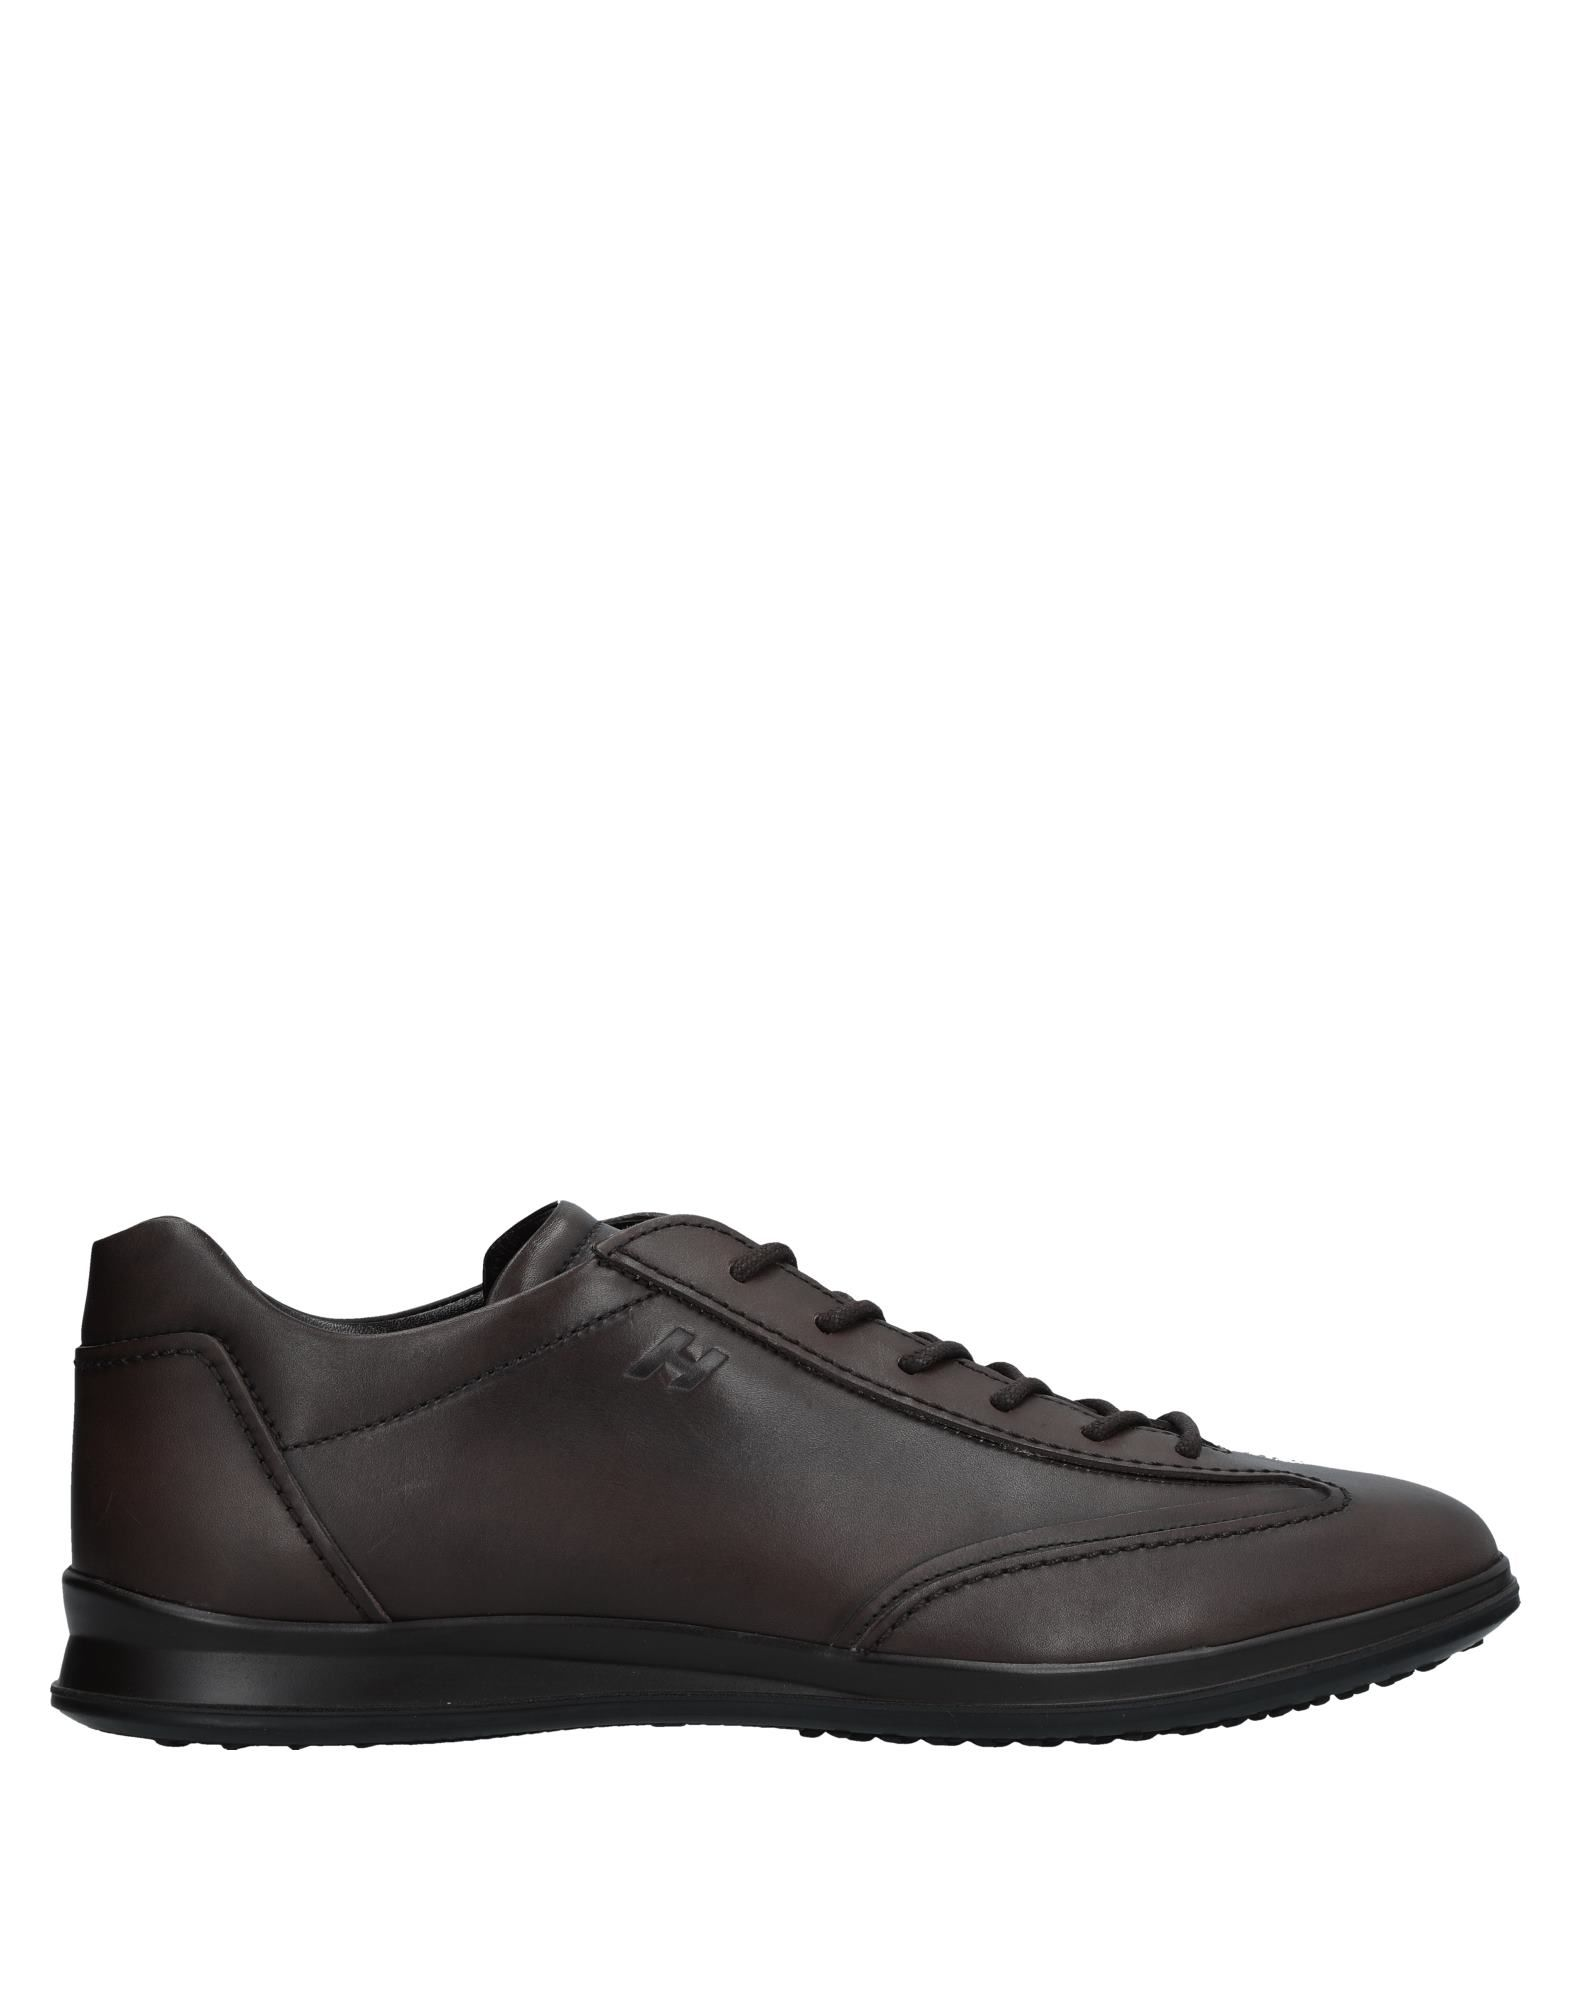 Hogan Sneakers Herren  11518569SV Gute Qualität beliebte Schuhe